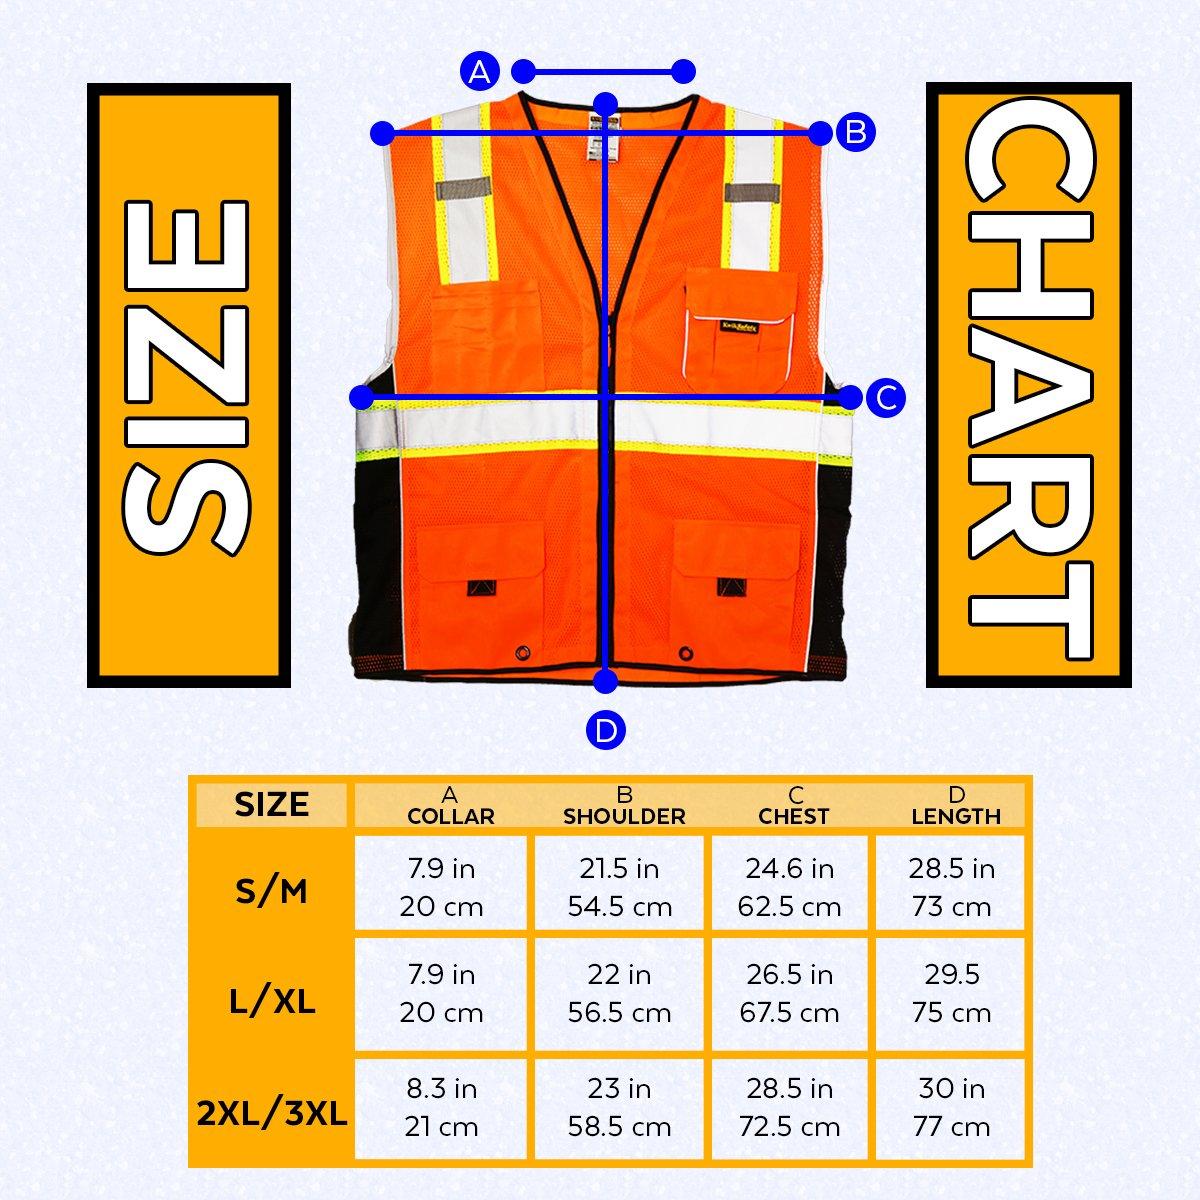 KwikSafety CLASSIC Safety Vest | Class 2 ANSI OSHA PPE | High Visibility Reflective Stripes, Heavy Duty Mesh with Pockets and Zipper | Hi-Vis Construction Work Hi-Vis Surveyor | Orange S/M by KwikSafety (Image #8)